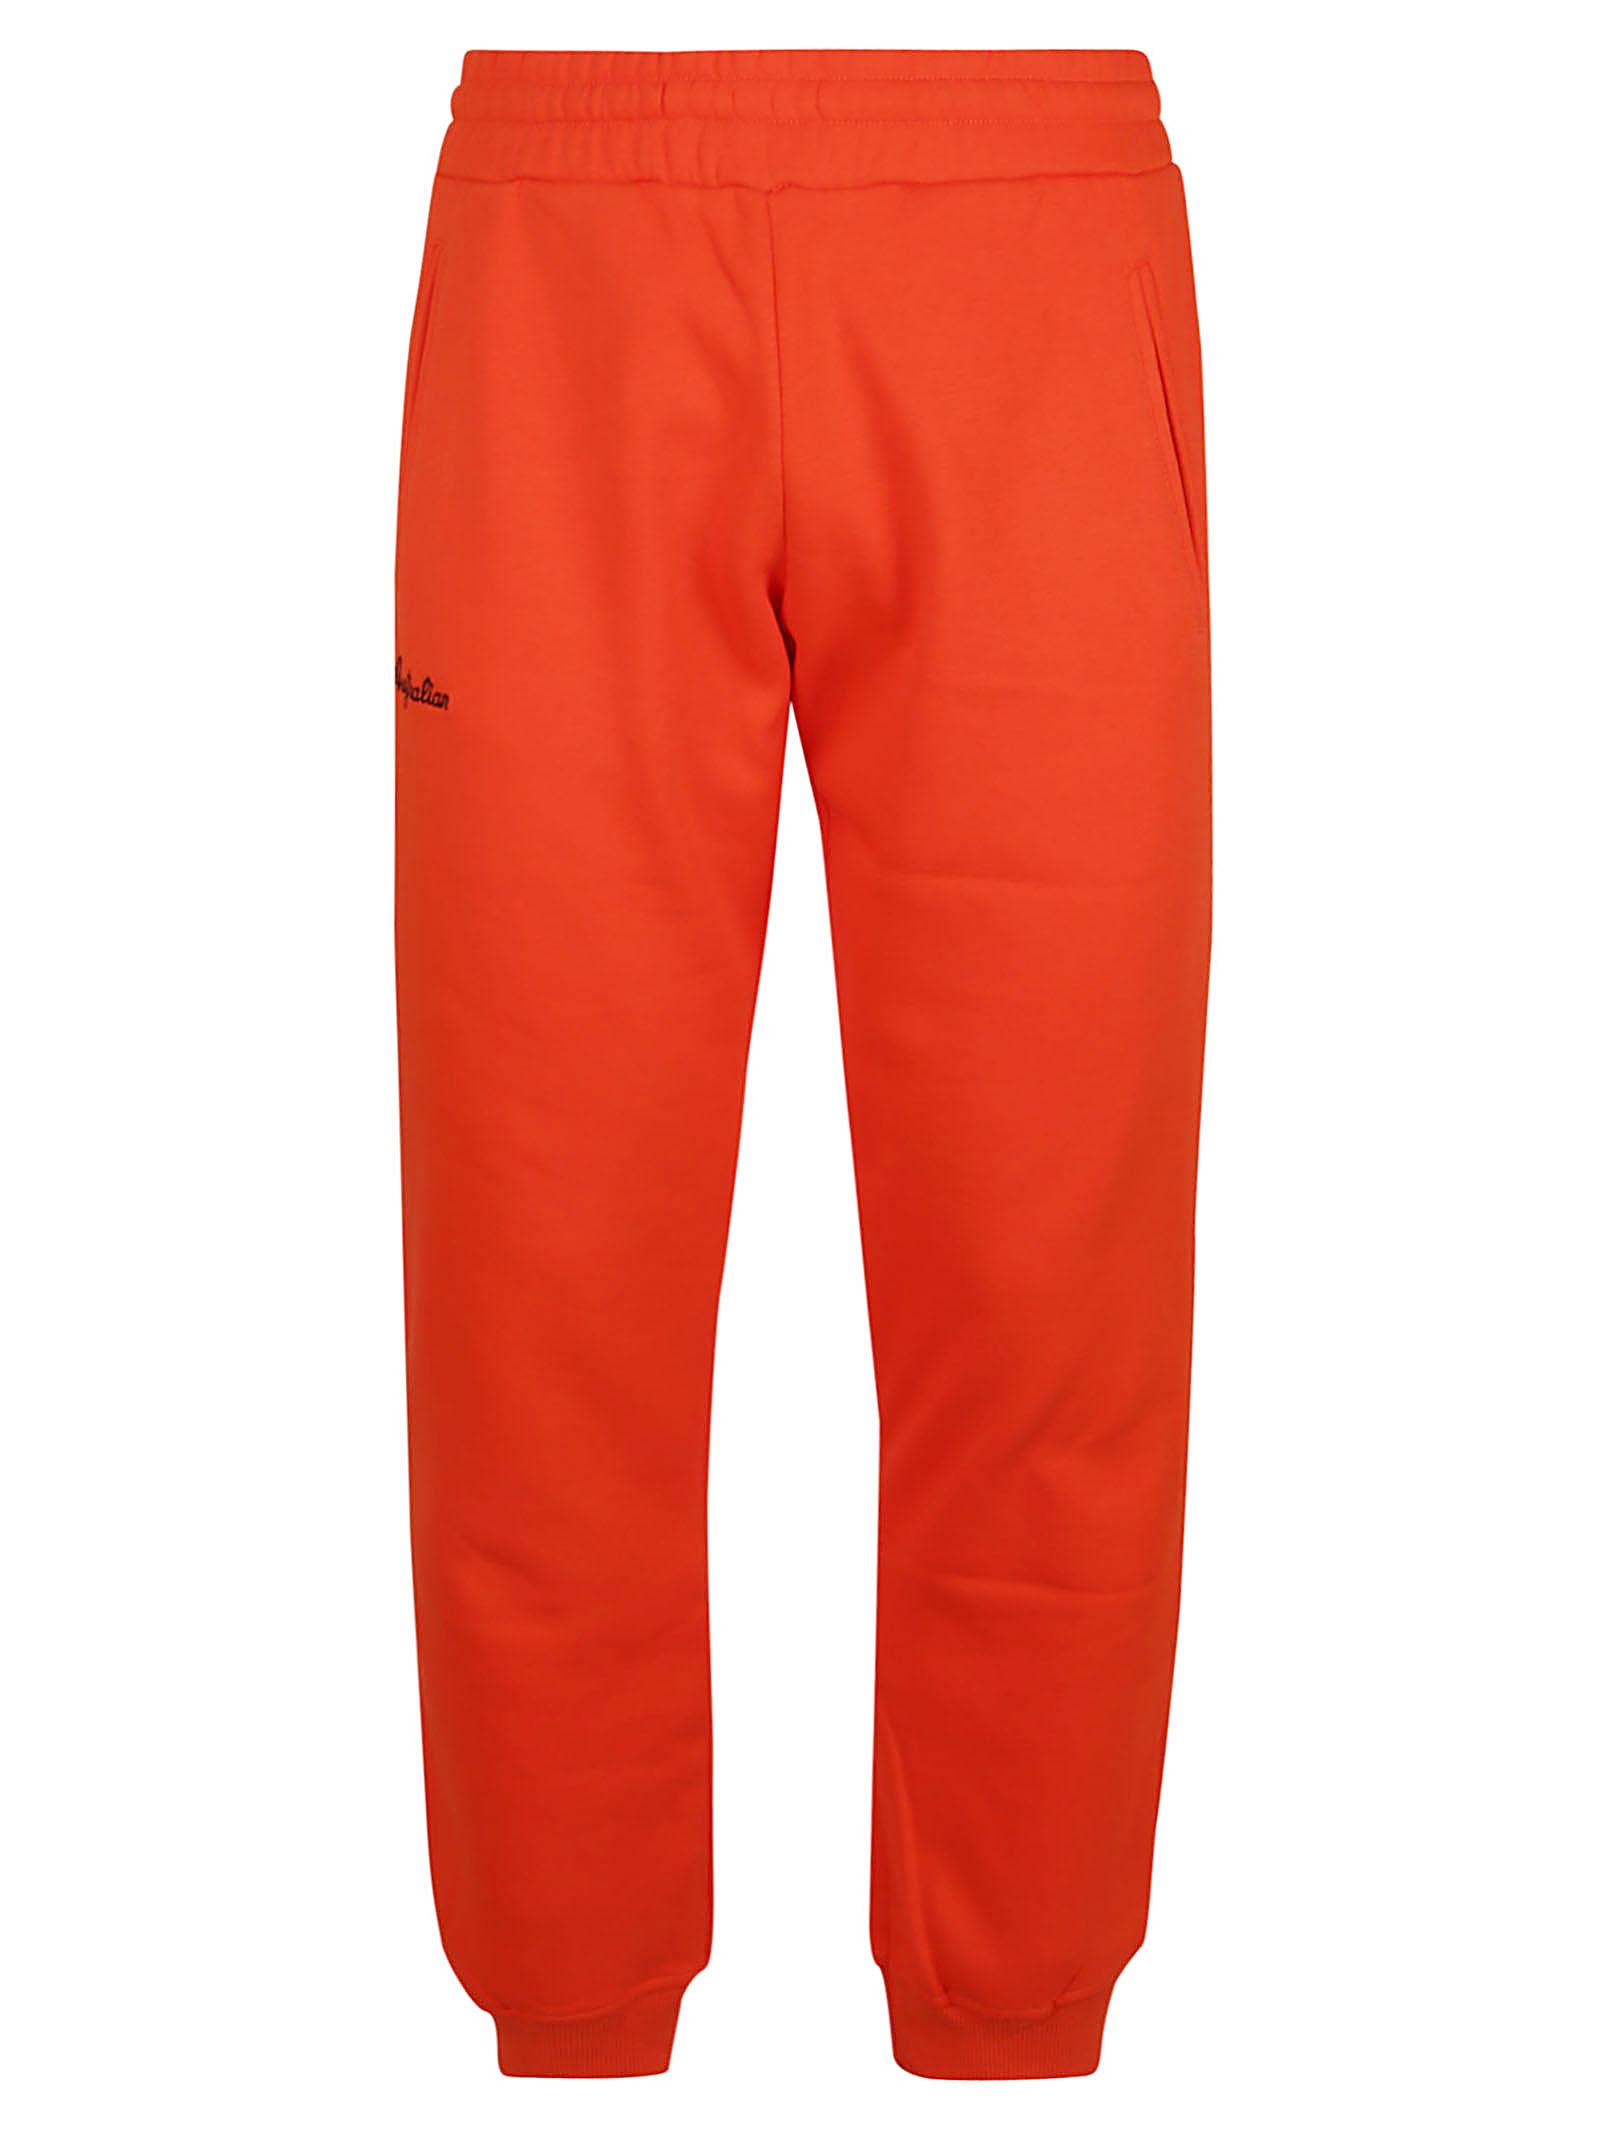 Winter Sweatpants With Rib Bottom